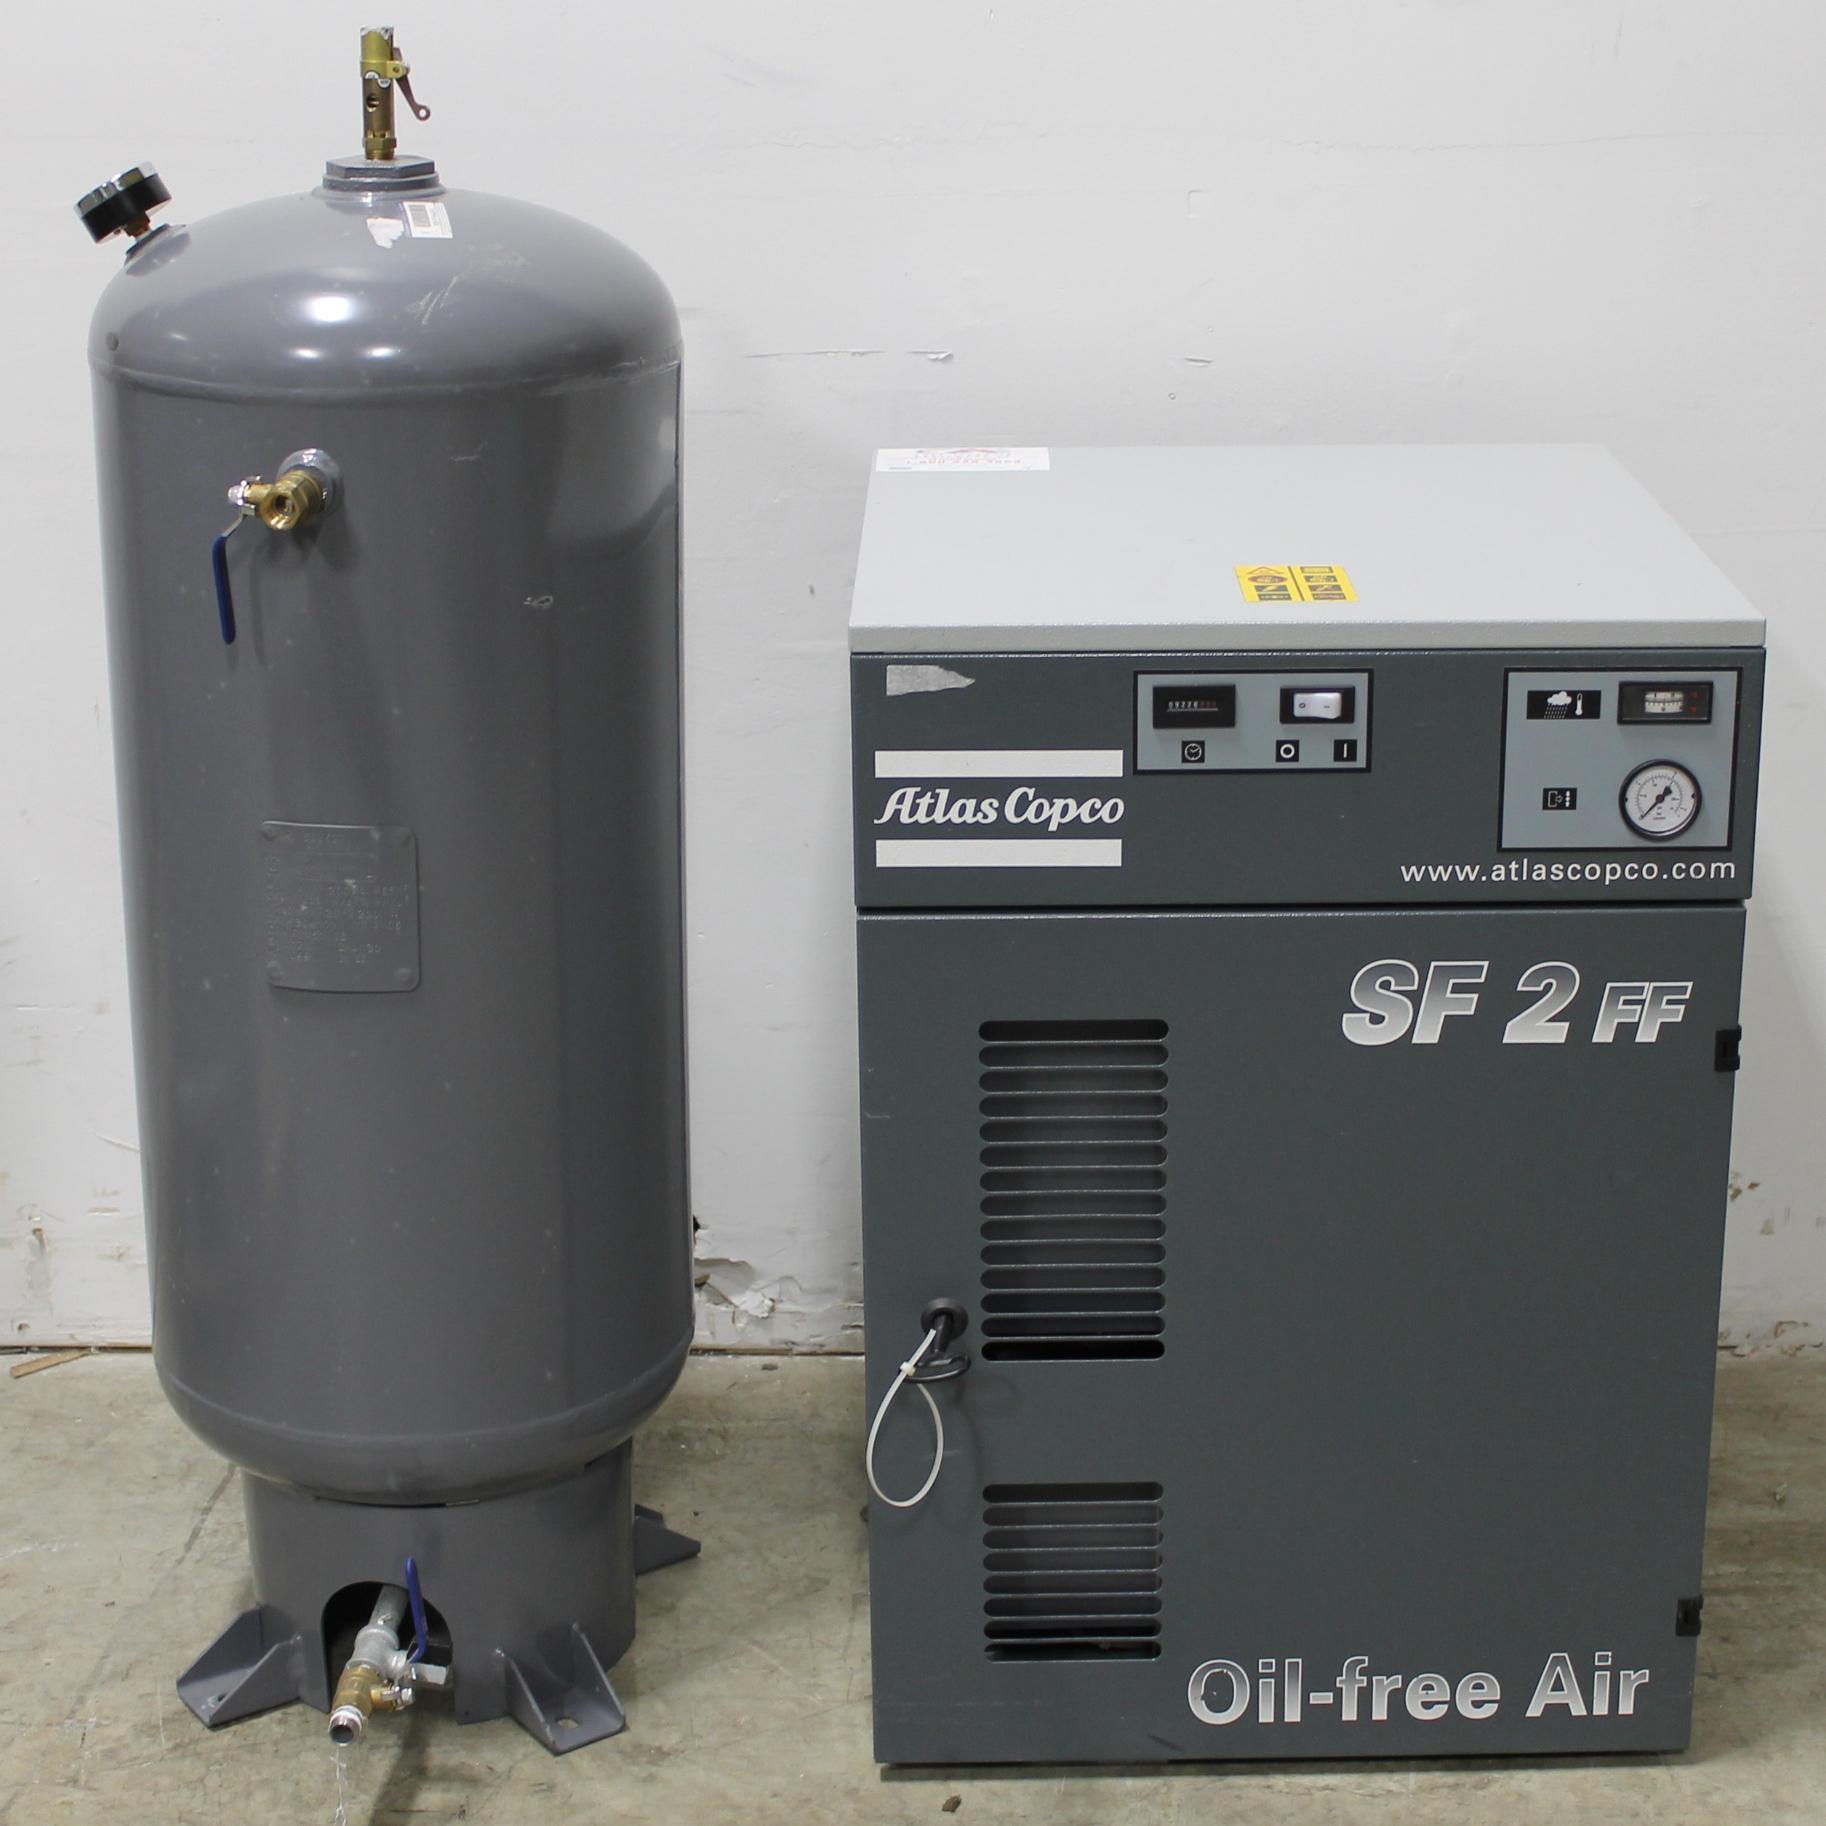 Refurbished Atlas Copco Sf2 Ff Oil Free Air Scroll Compressor